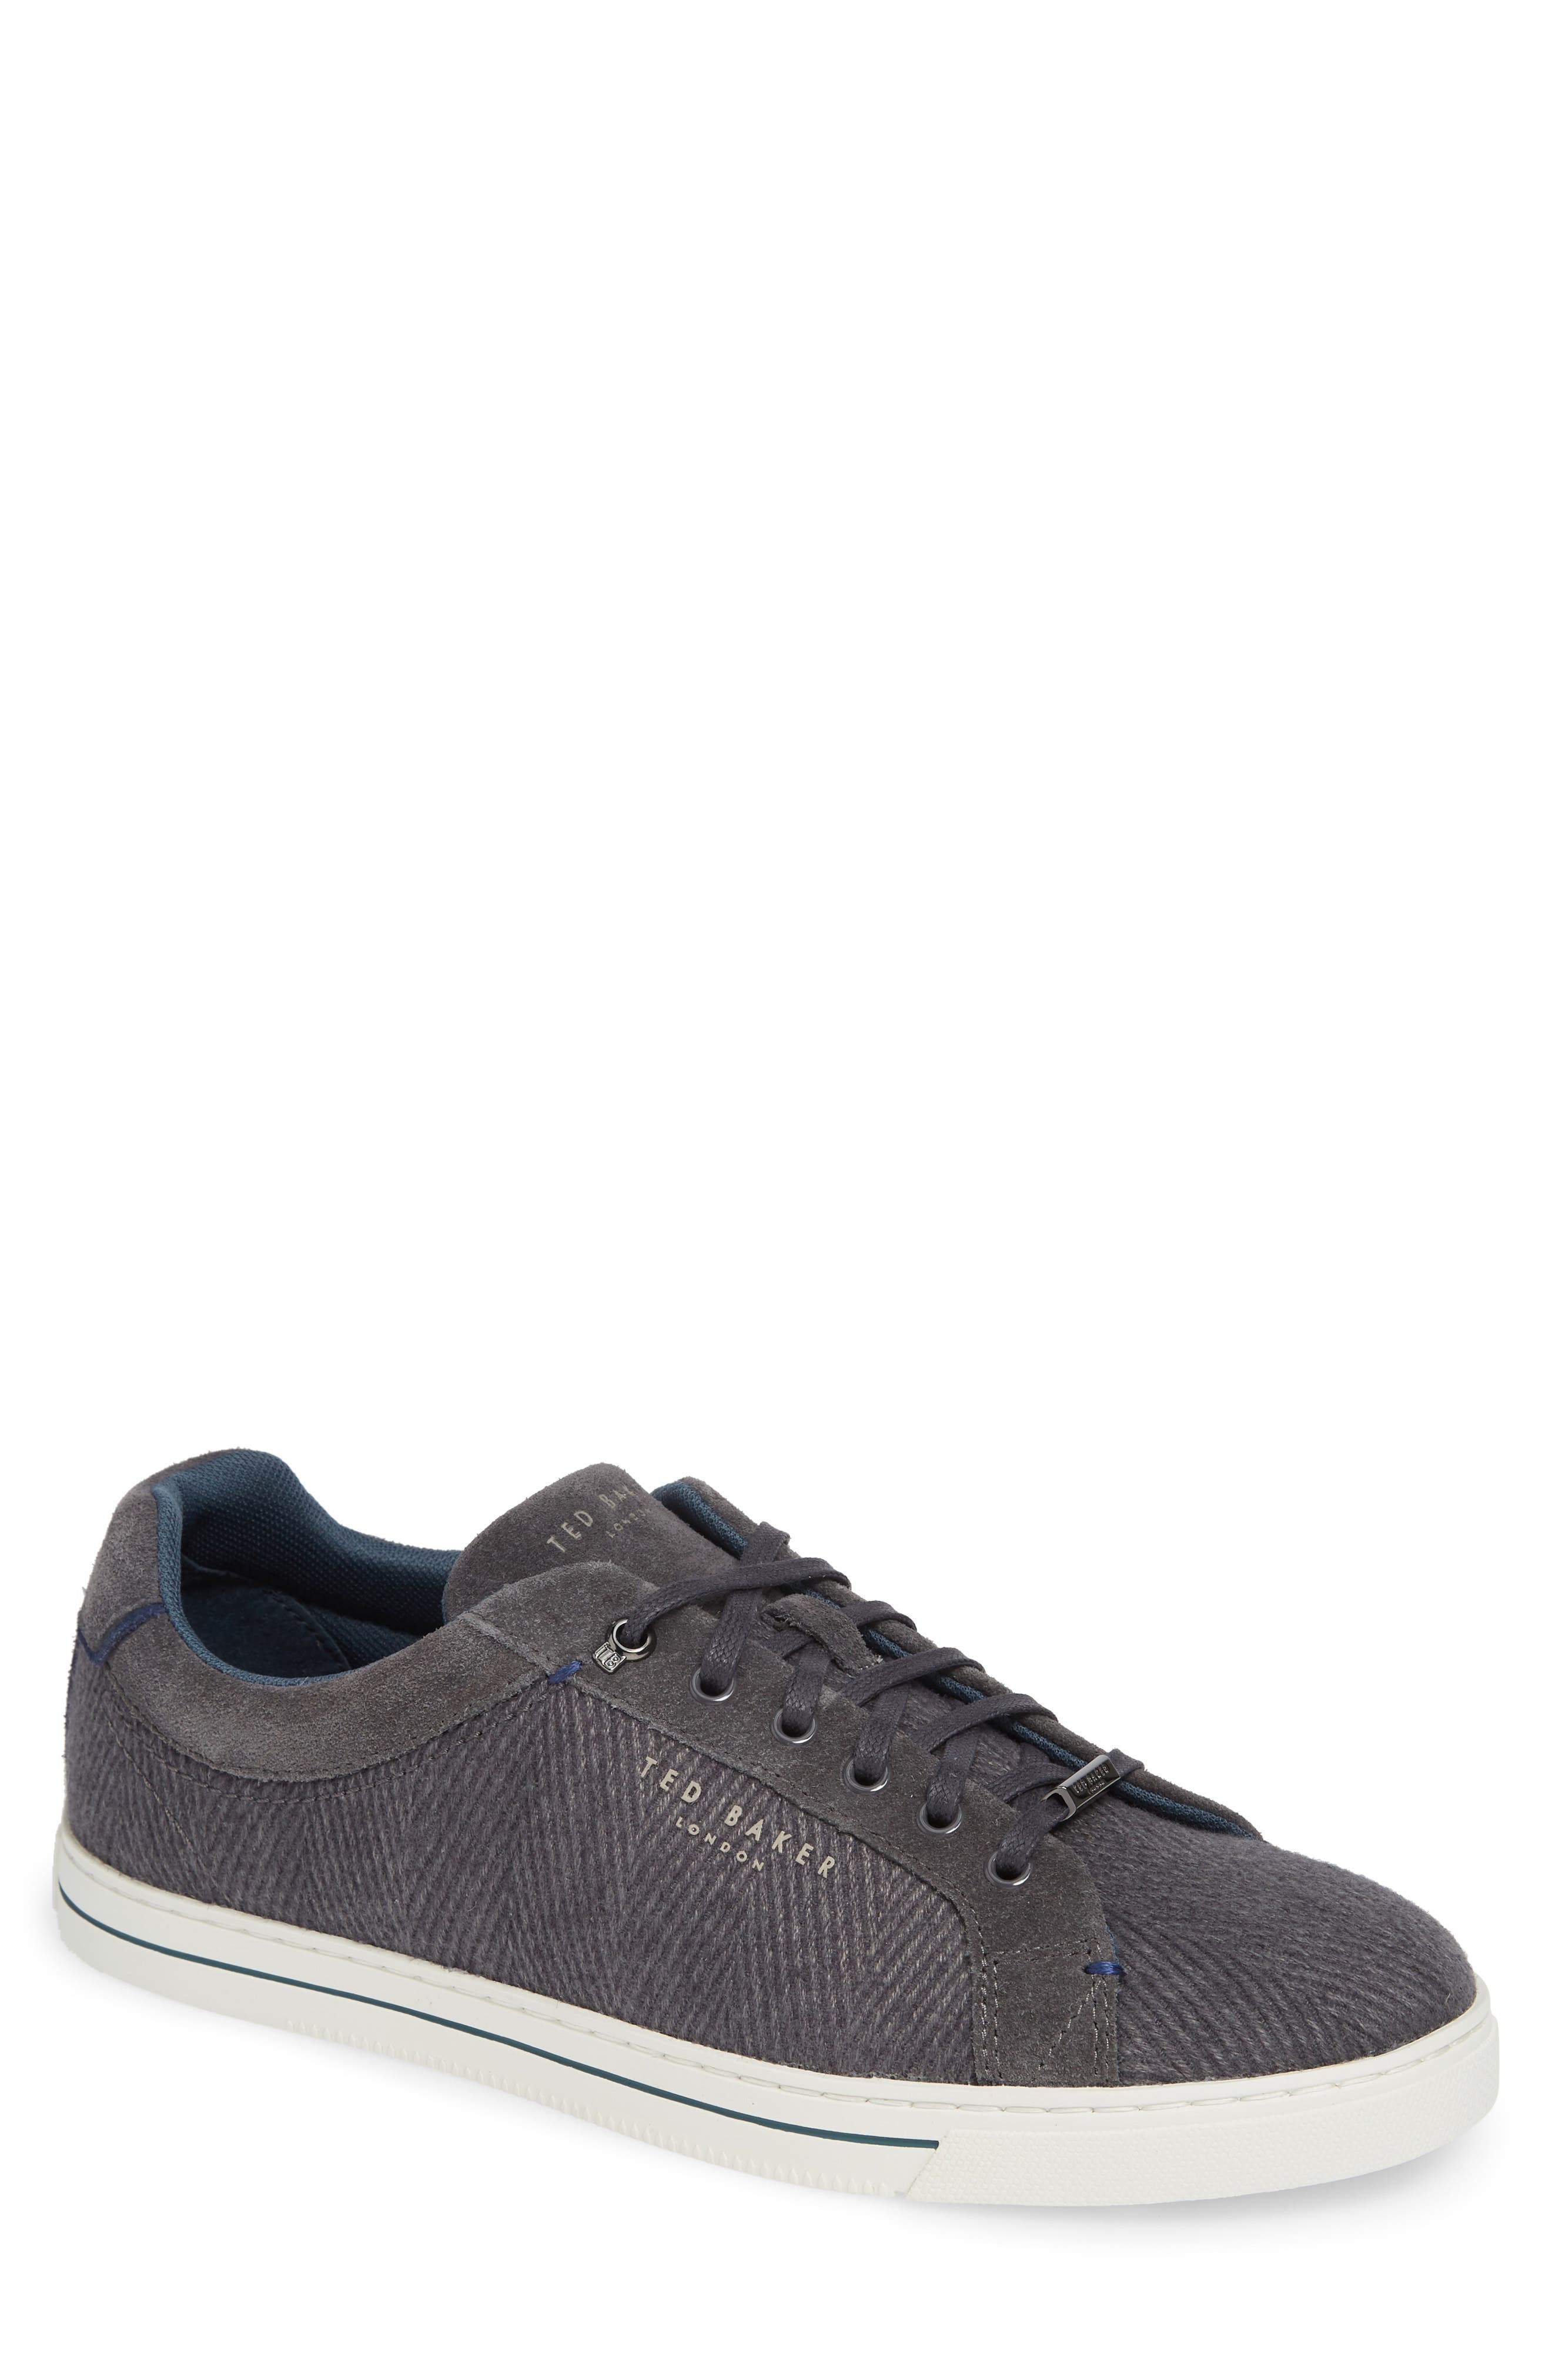 Werill Sneaker,                         Main,                         color, DARK GREY WOOL